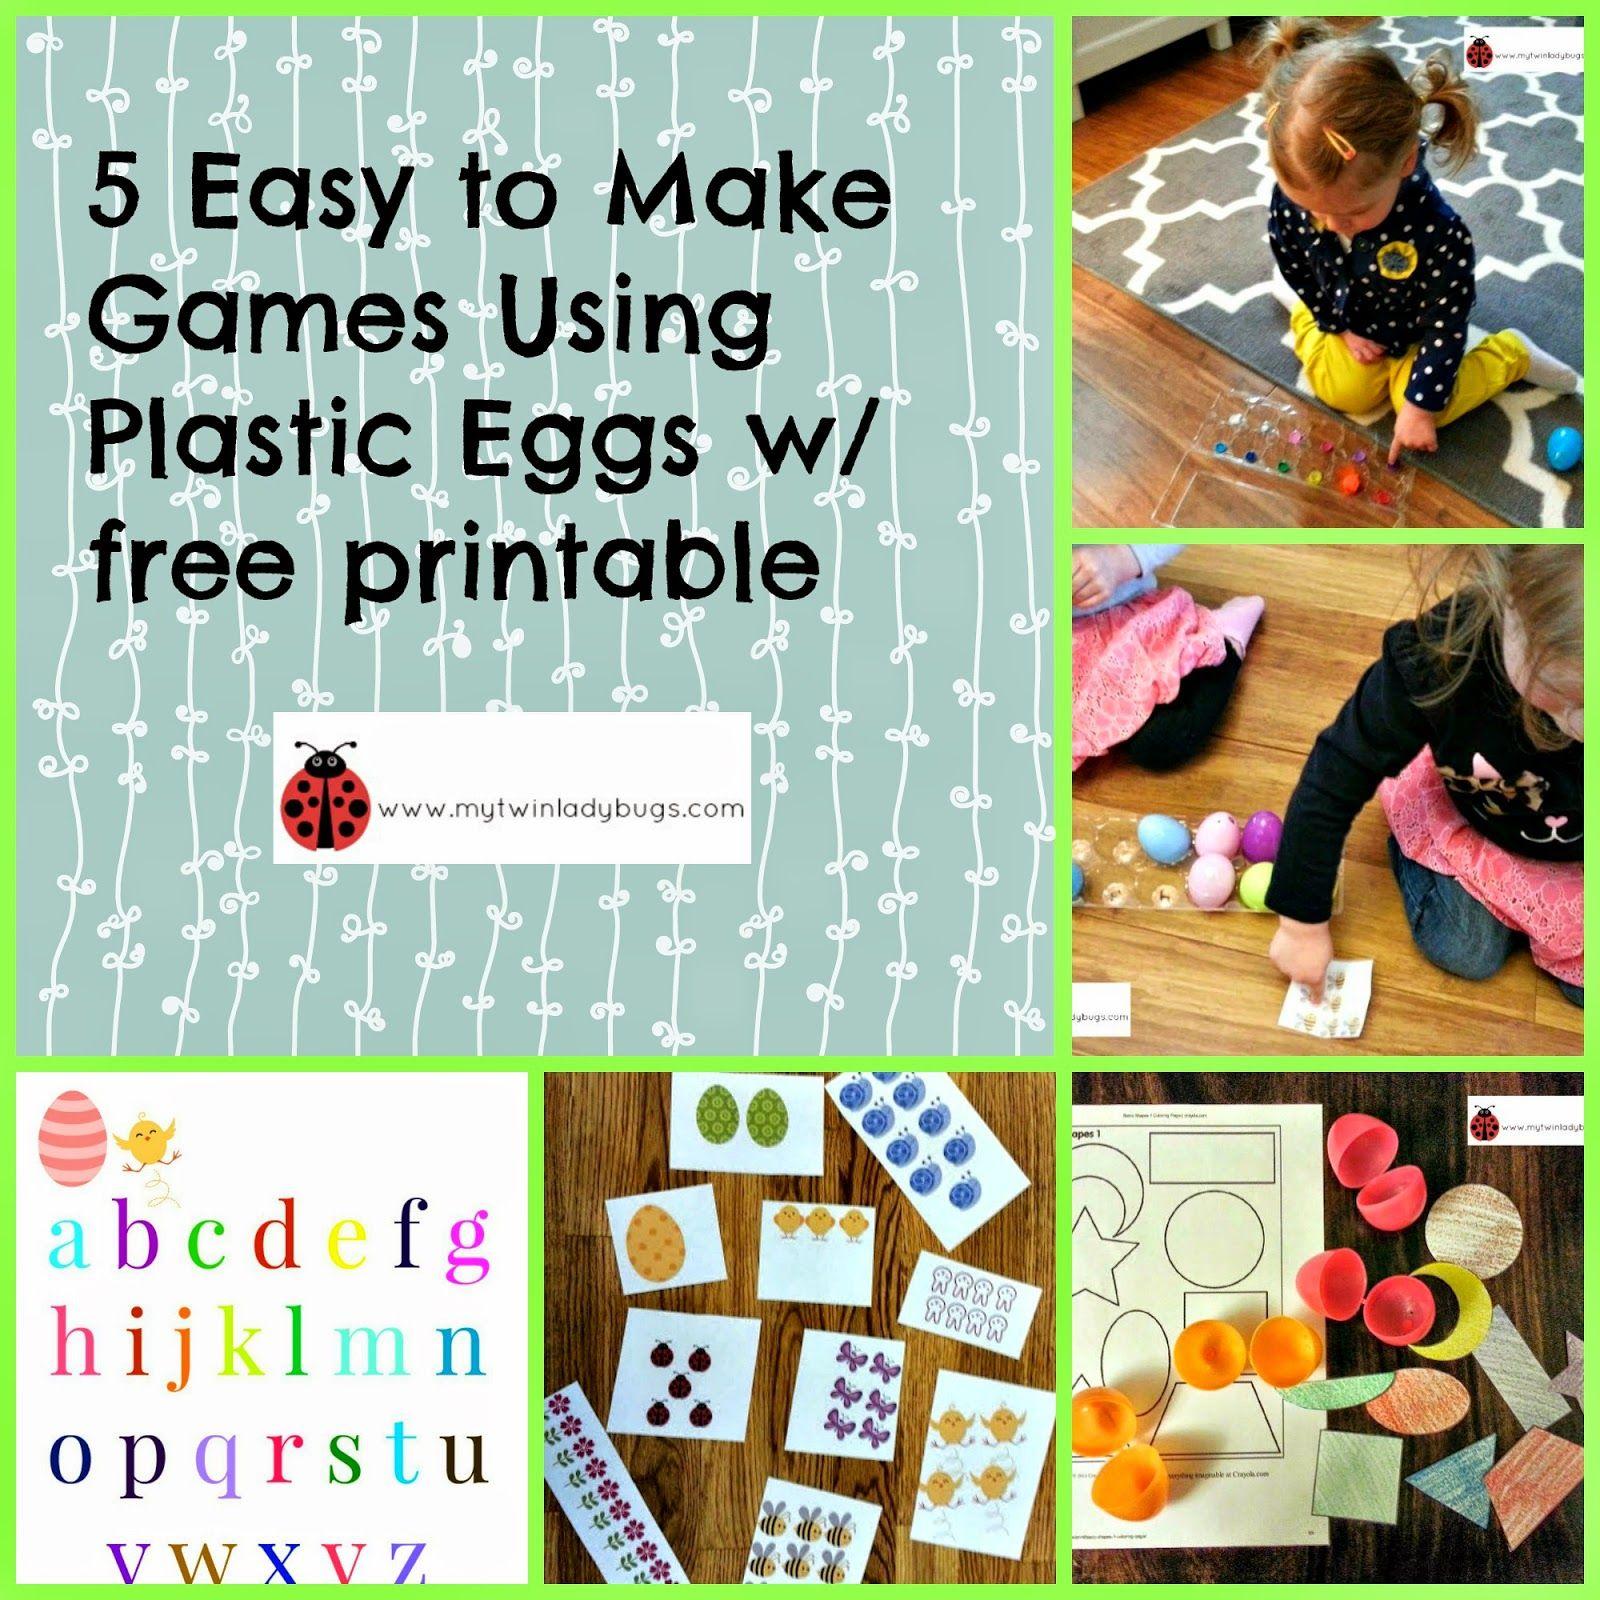 5 Easy To Make Games Using Plastic Easter Eggs For